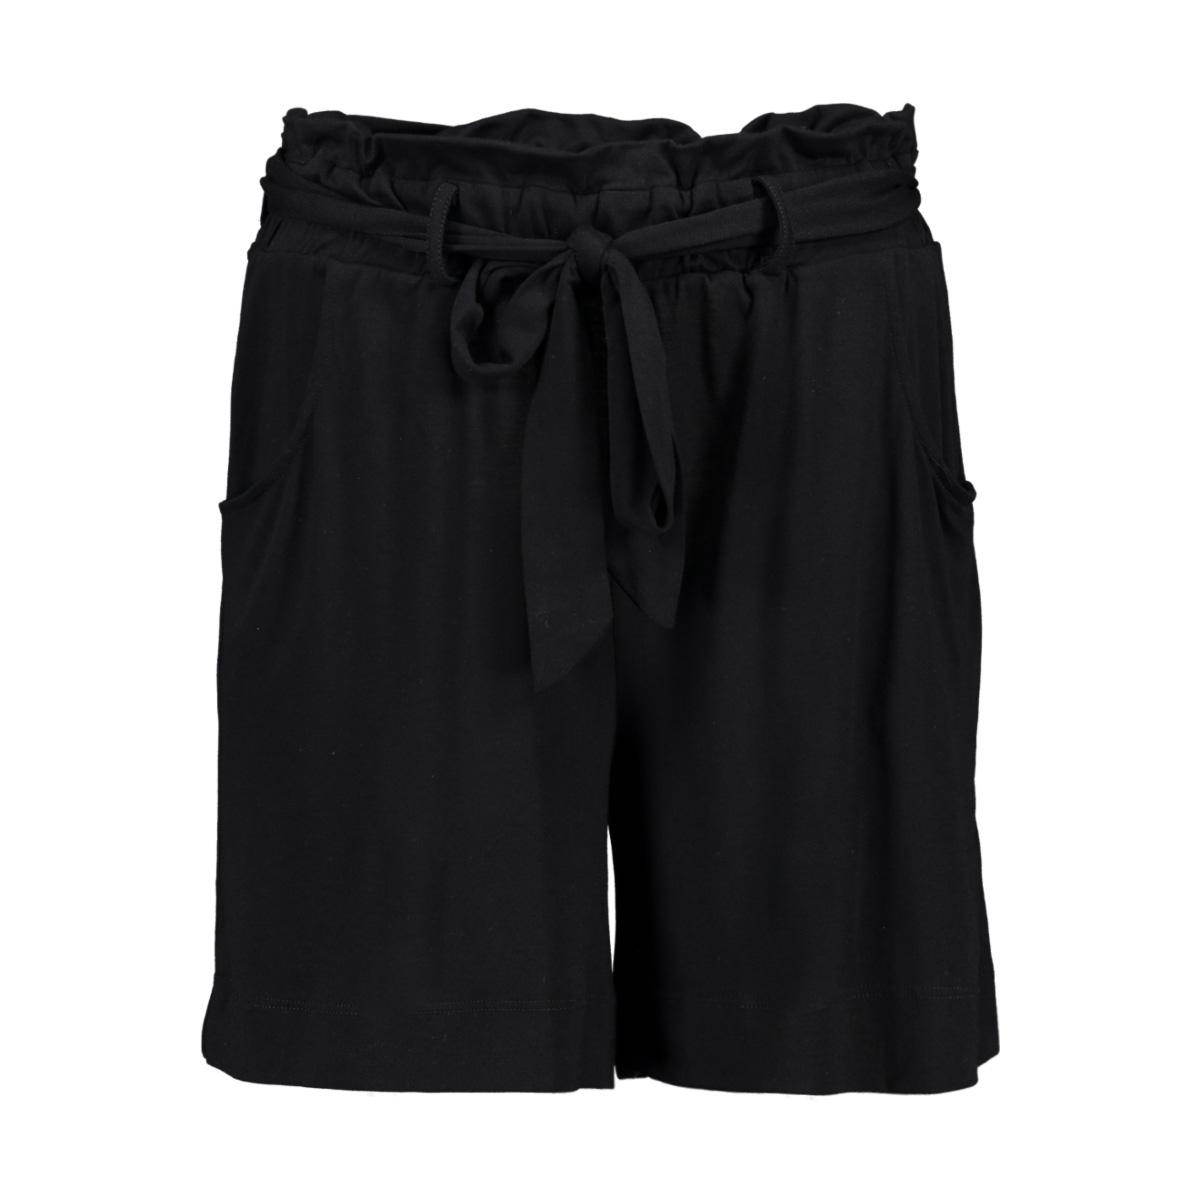 objsimona shorts 103 23029532 object korte broek black/solid